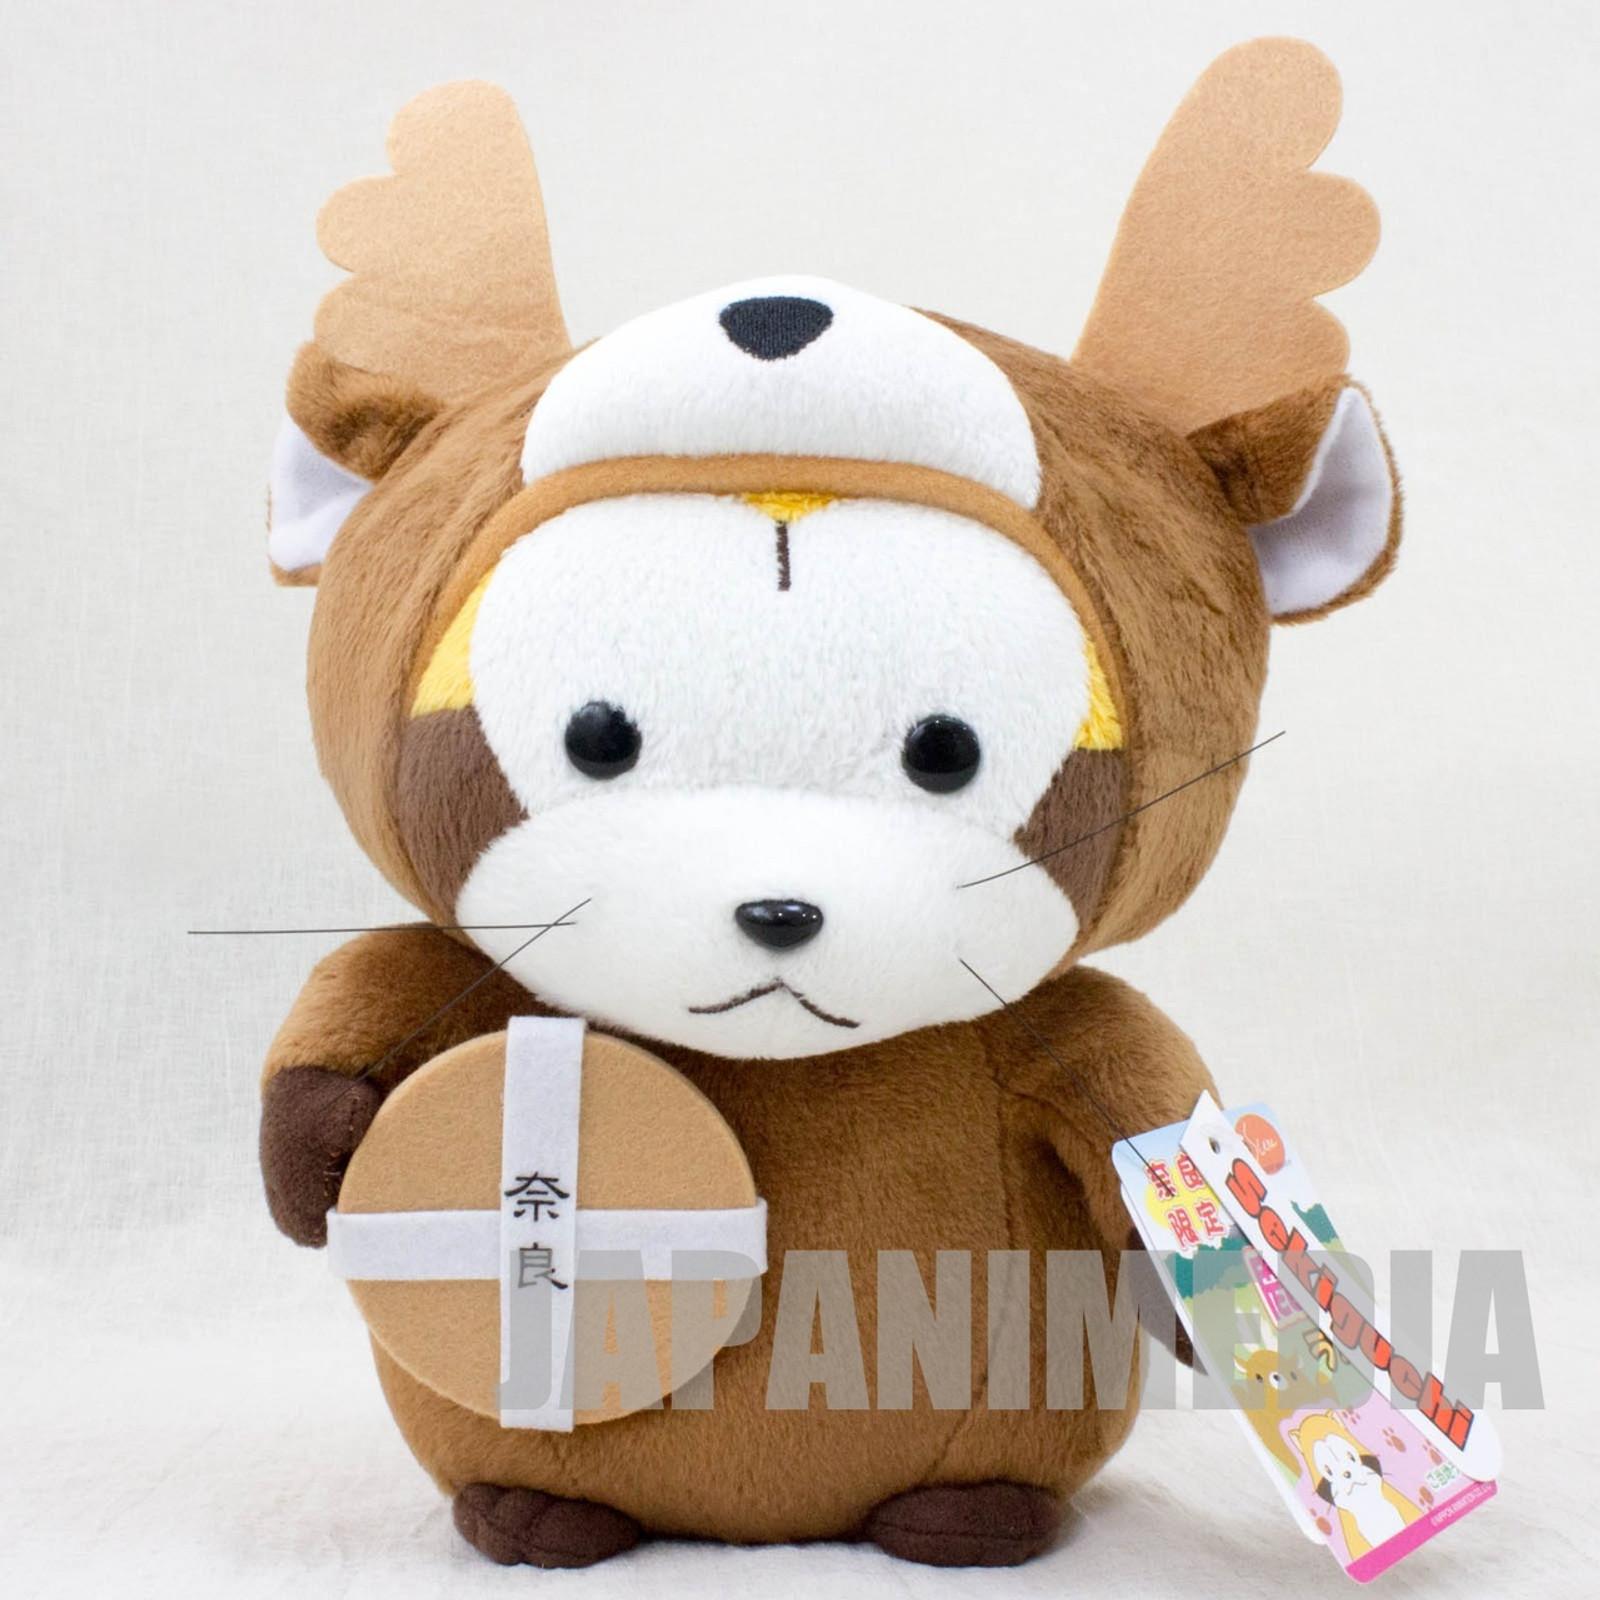 Rascal the Raccoon Nara Deer Cosplay Limited Plush Doll Figure JAPAN